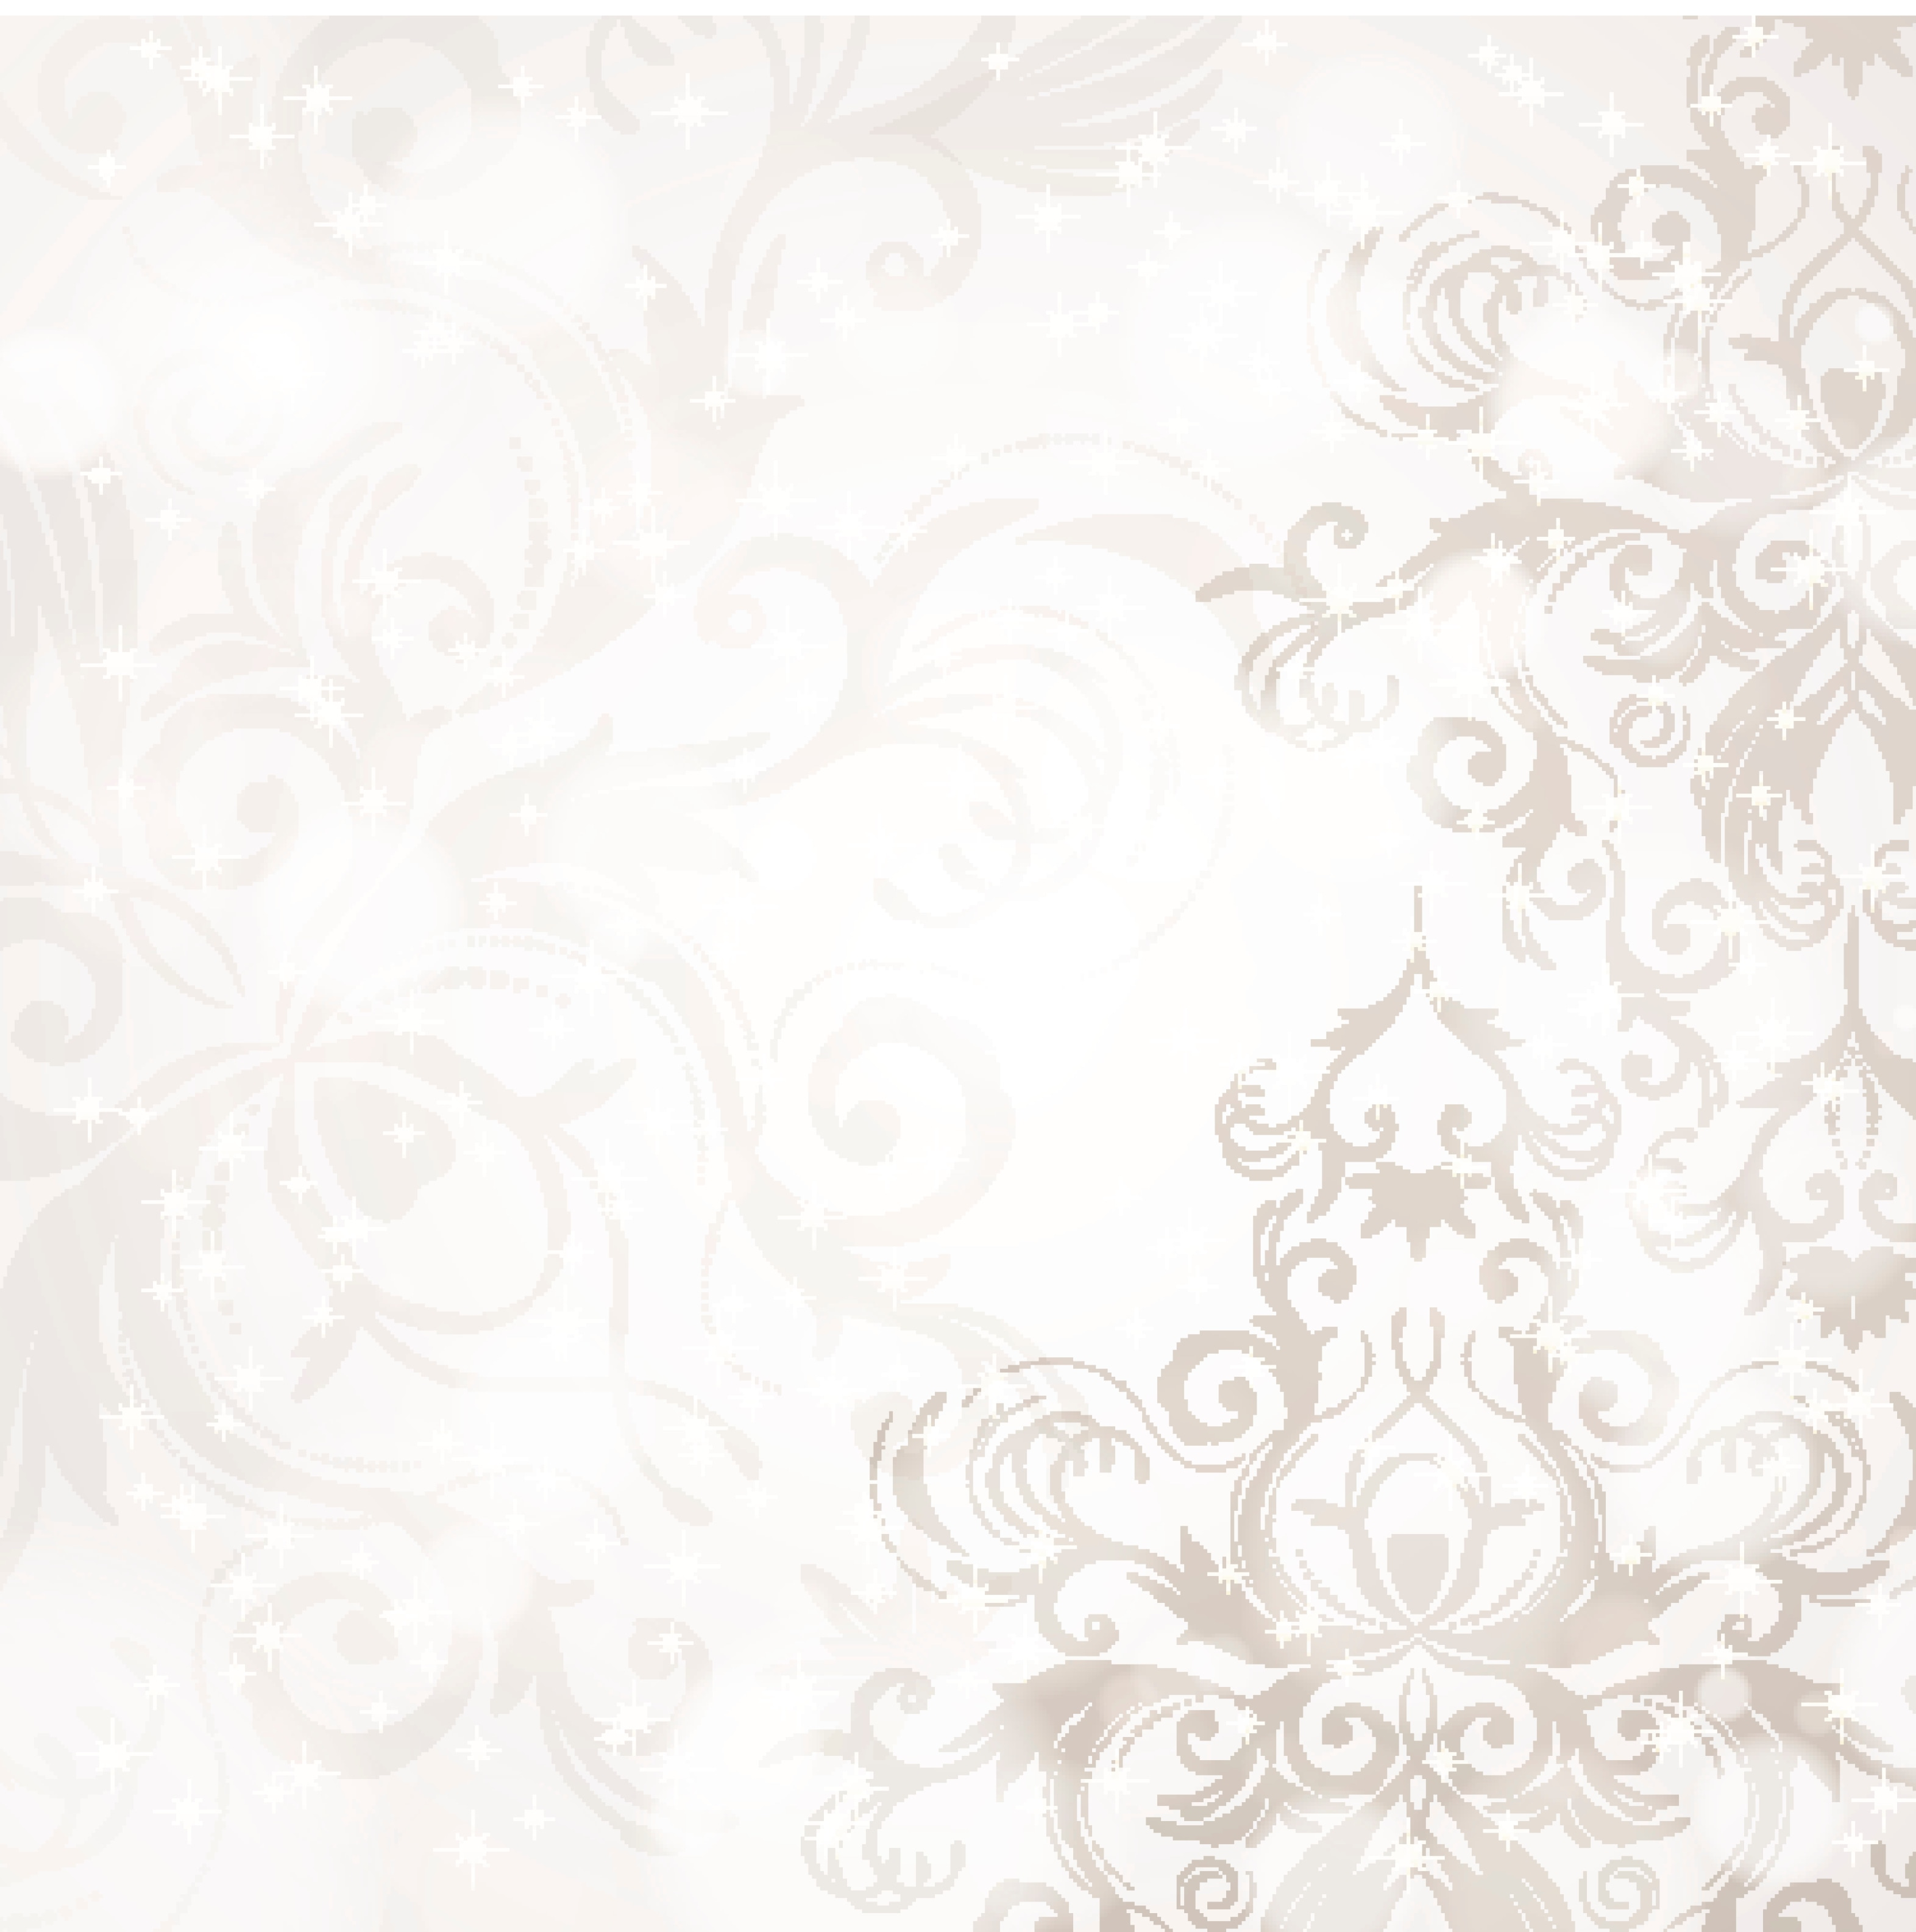 Awallpapers 7 Sfondi Eleganti E Minimalisti Per